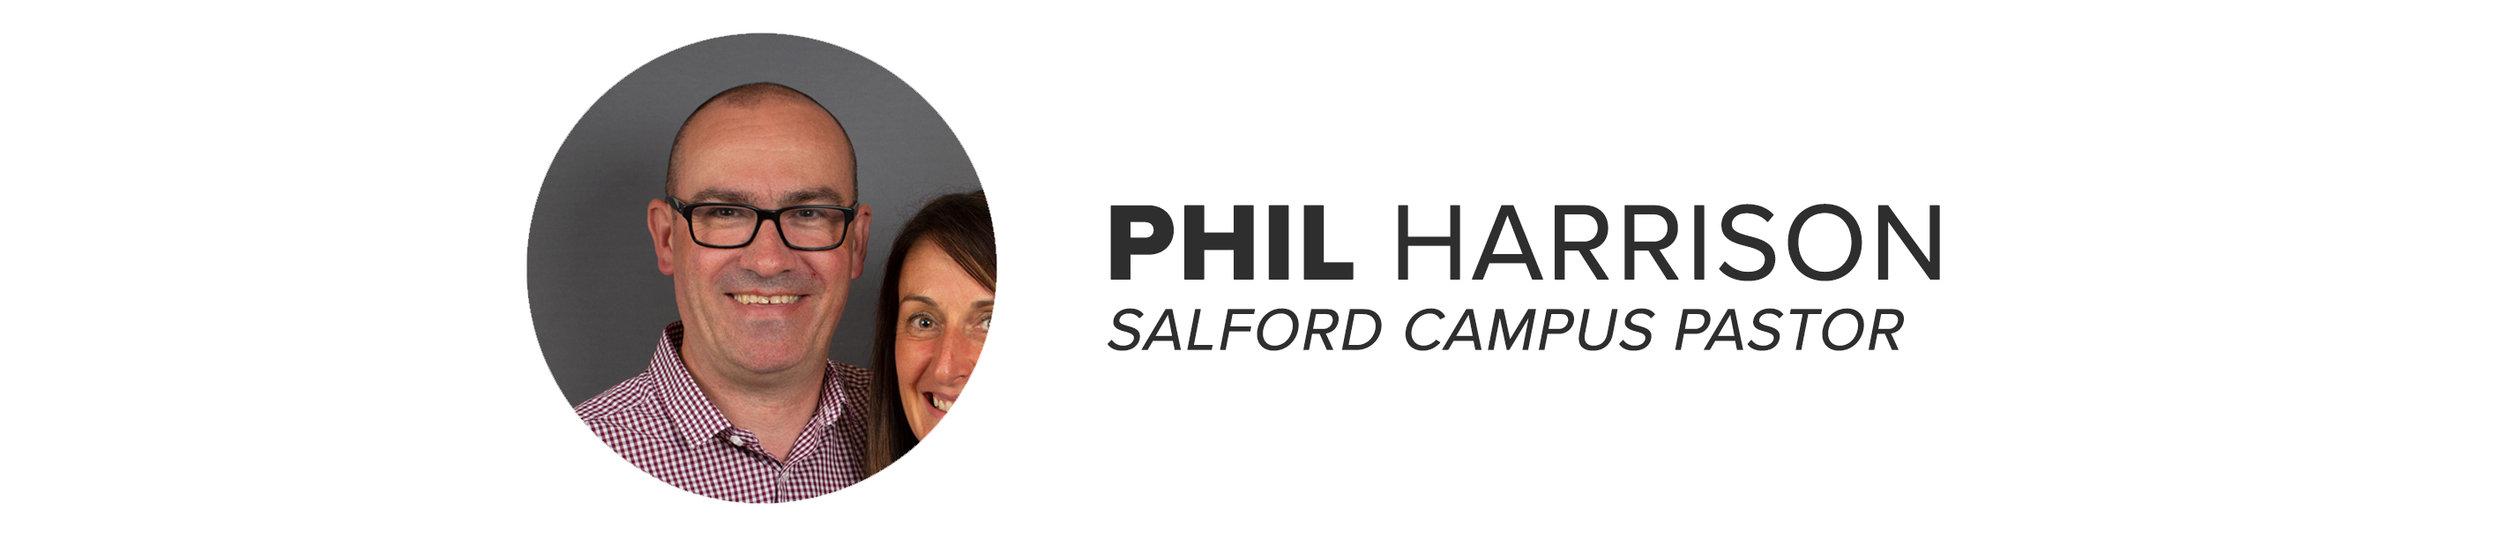 Phil-Harrison-Image.jpg